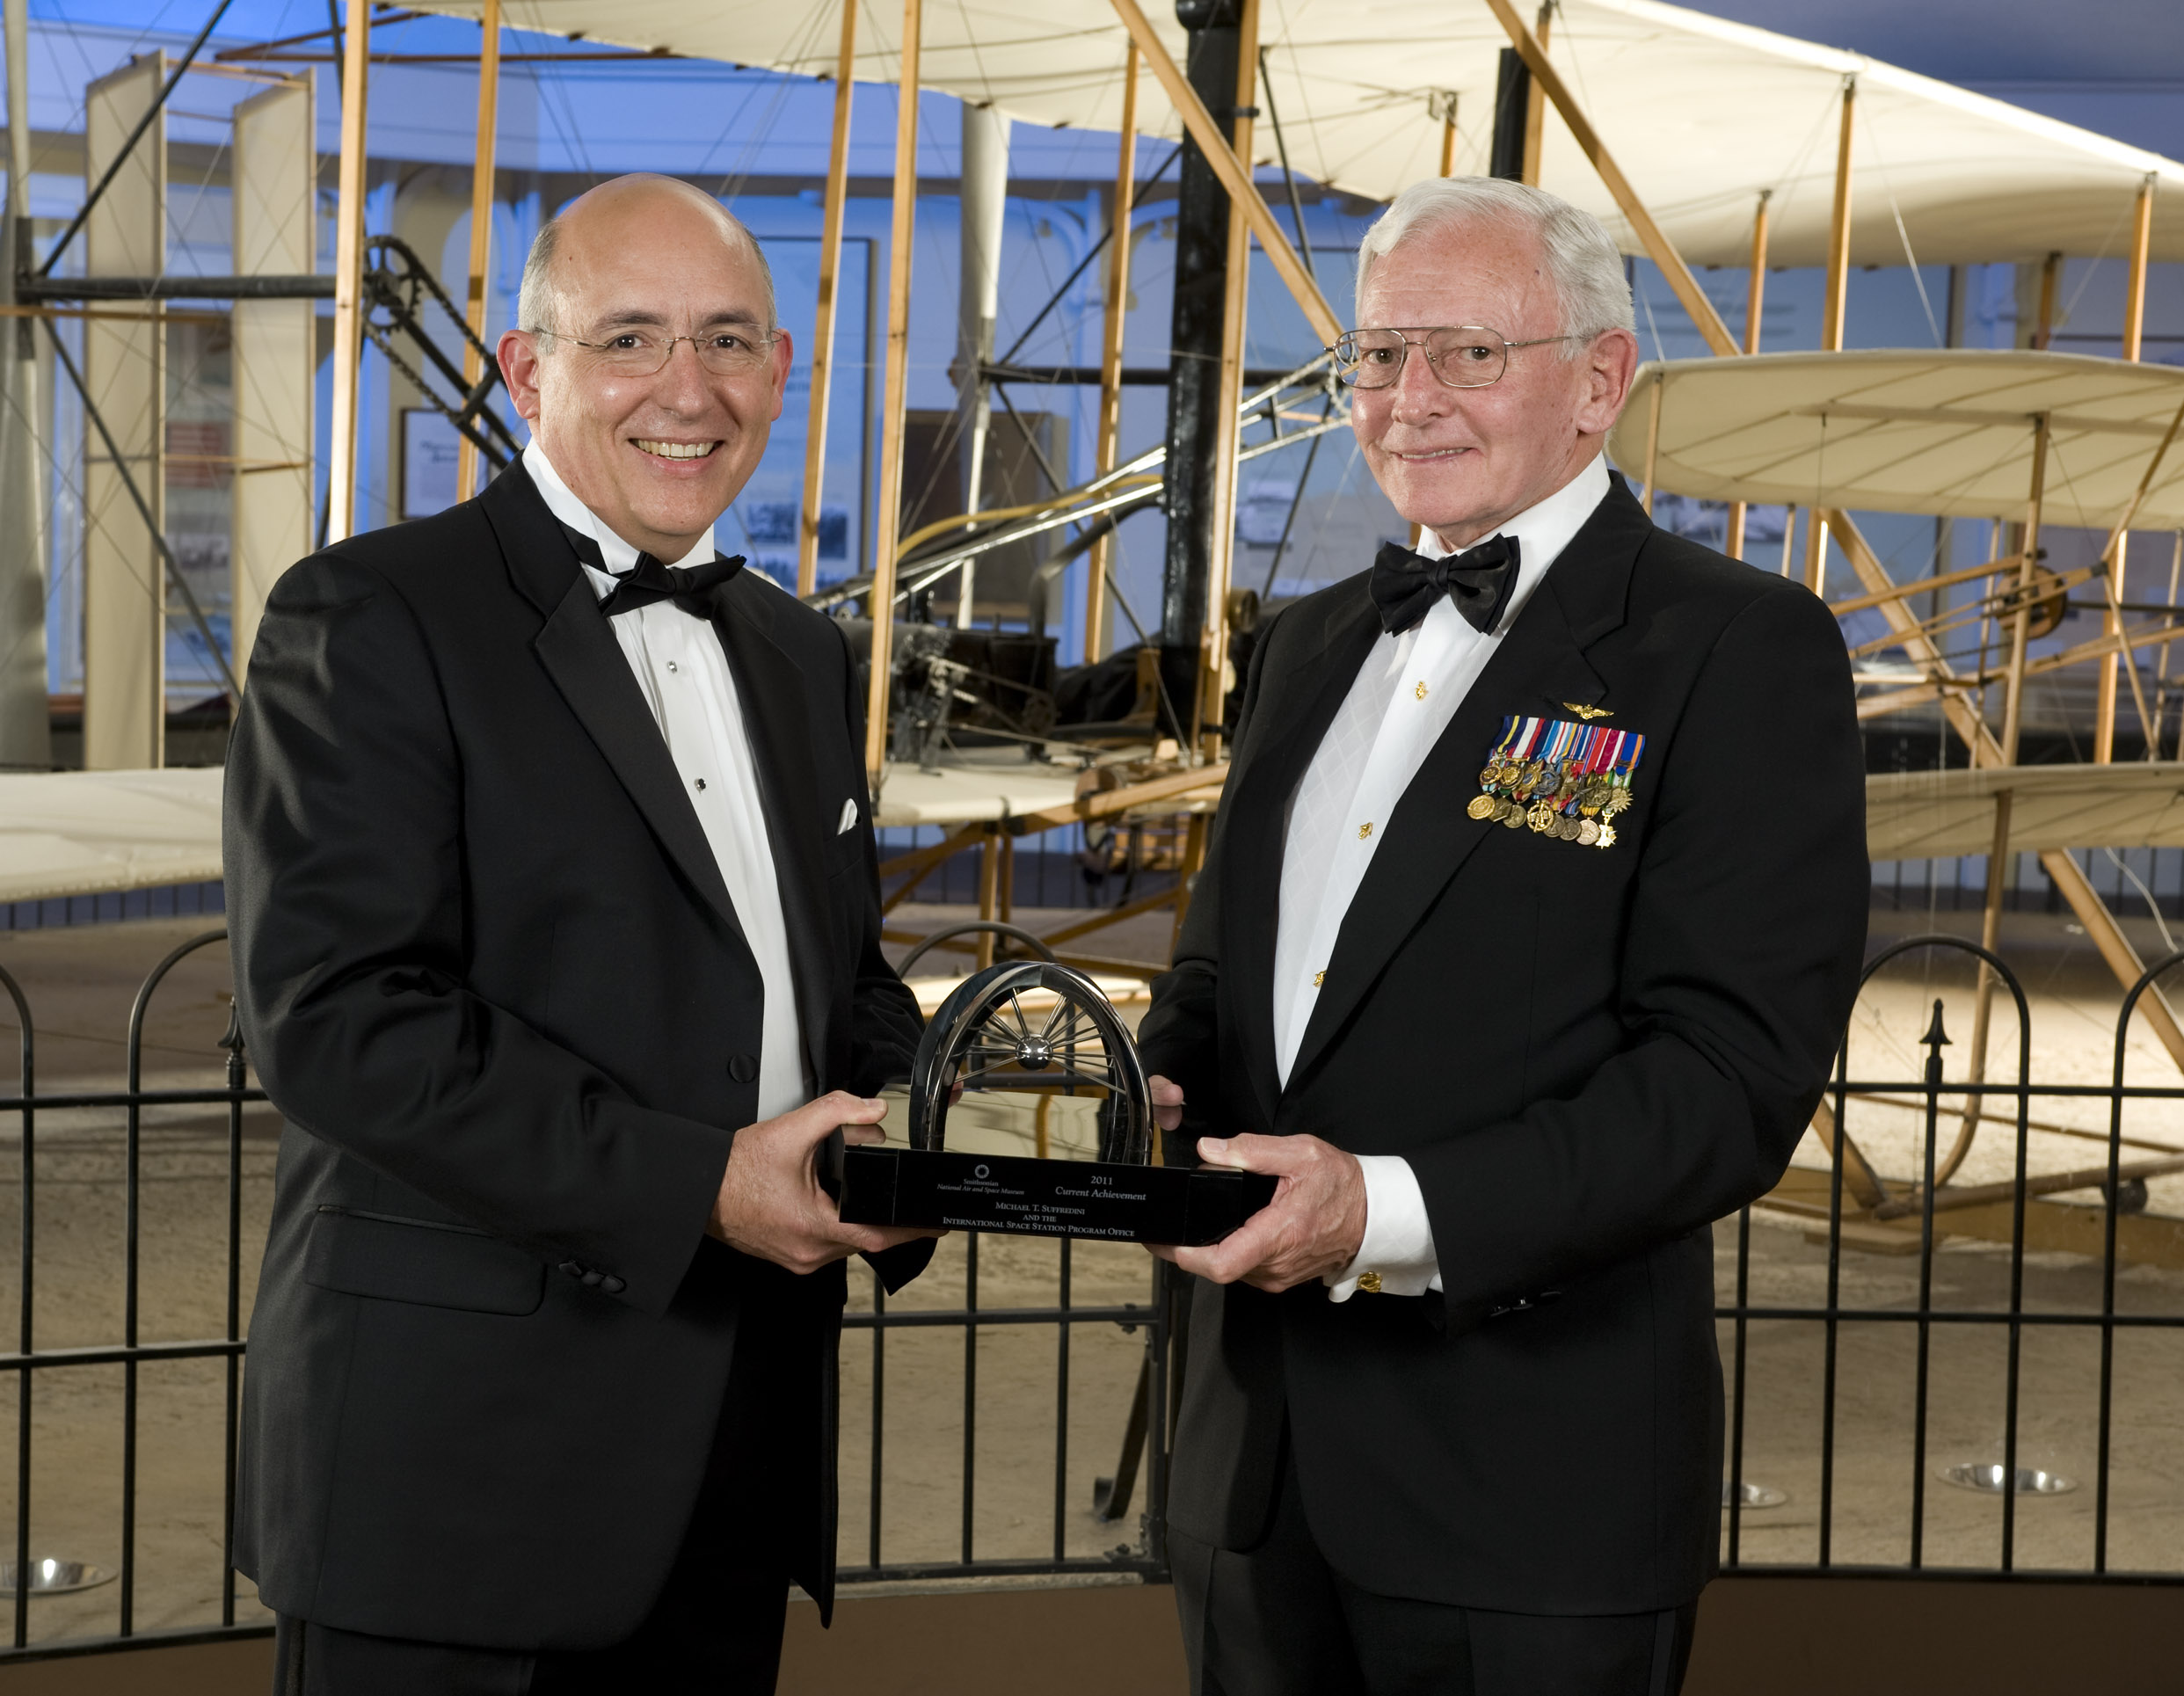 Trophy Current Achievement Winner 2011 - Michael Suffredini